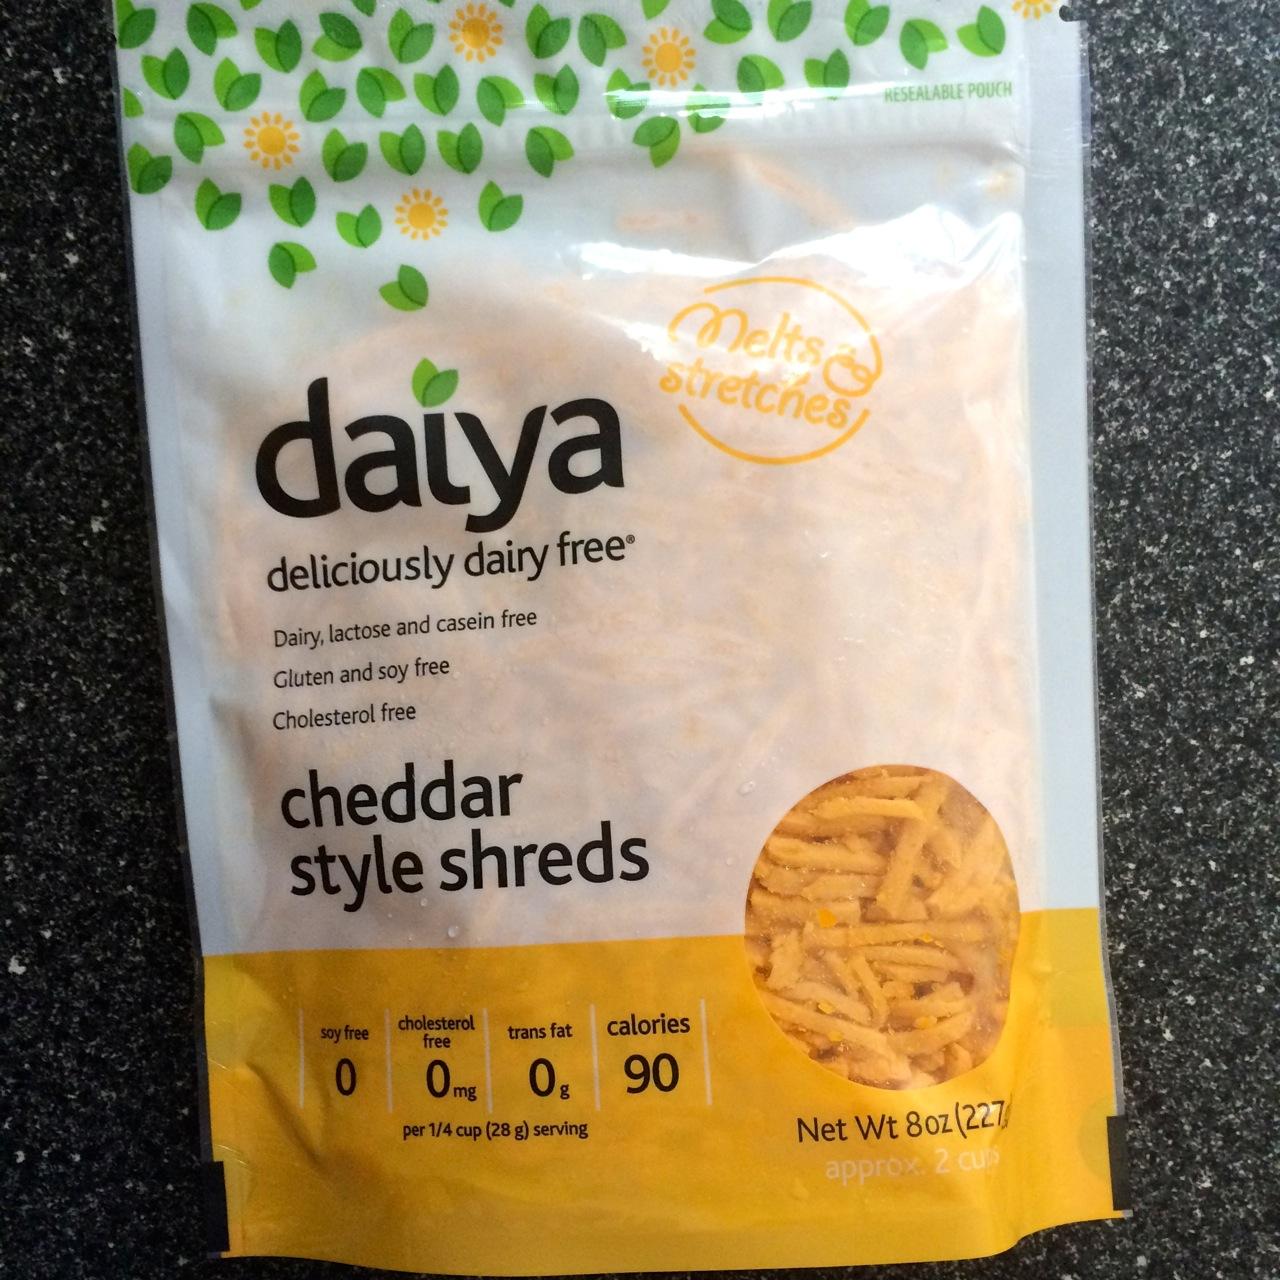 http://i0.wp.com/fatgayvegan.com/wp-content/uploads/2015/06/daiya-cheddar-style-shreds-bag.jpg?fit=1280%2C1280